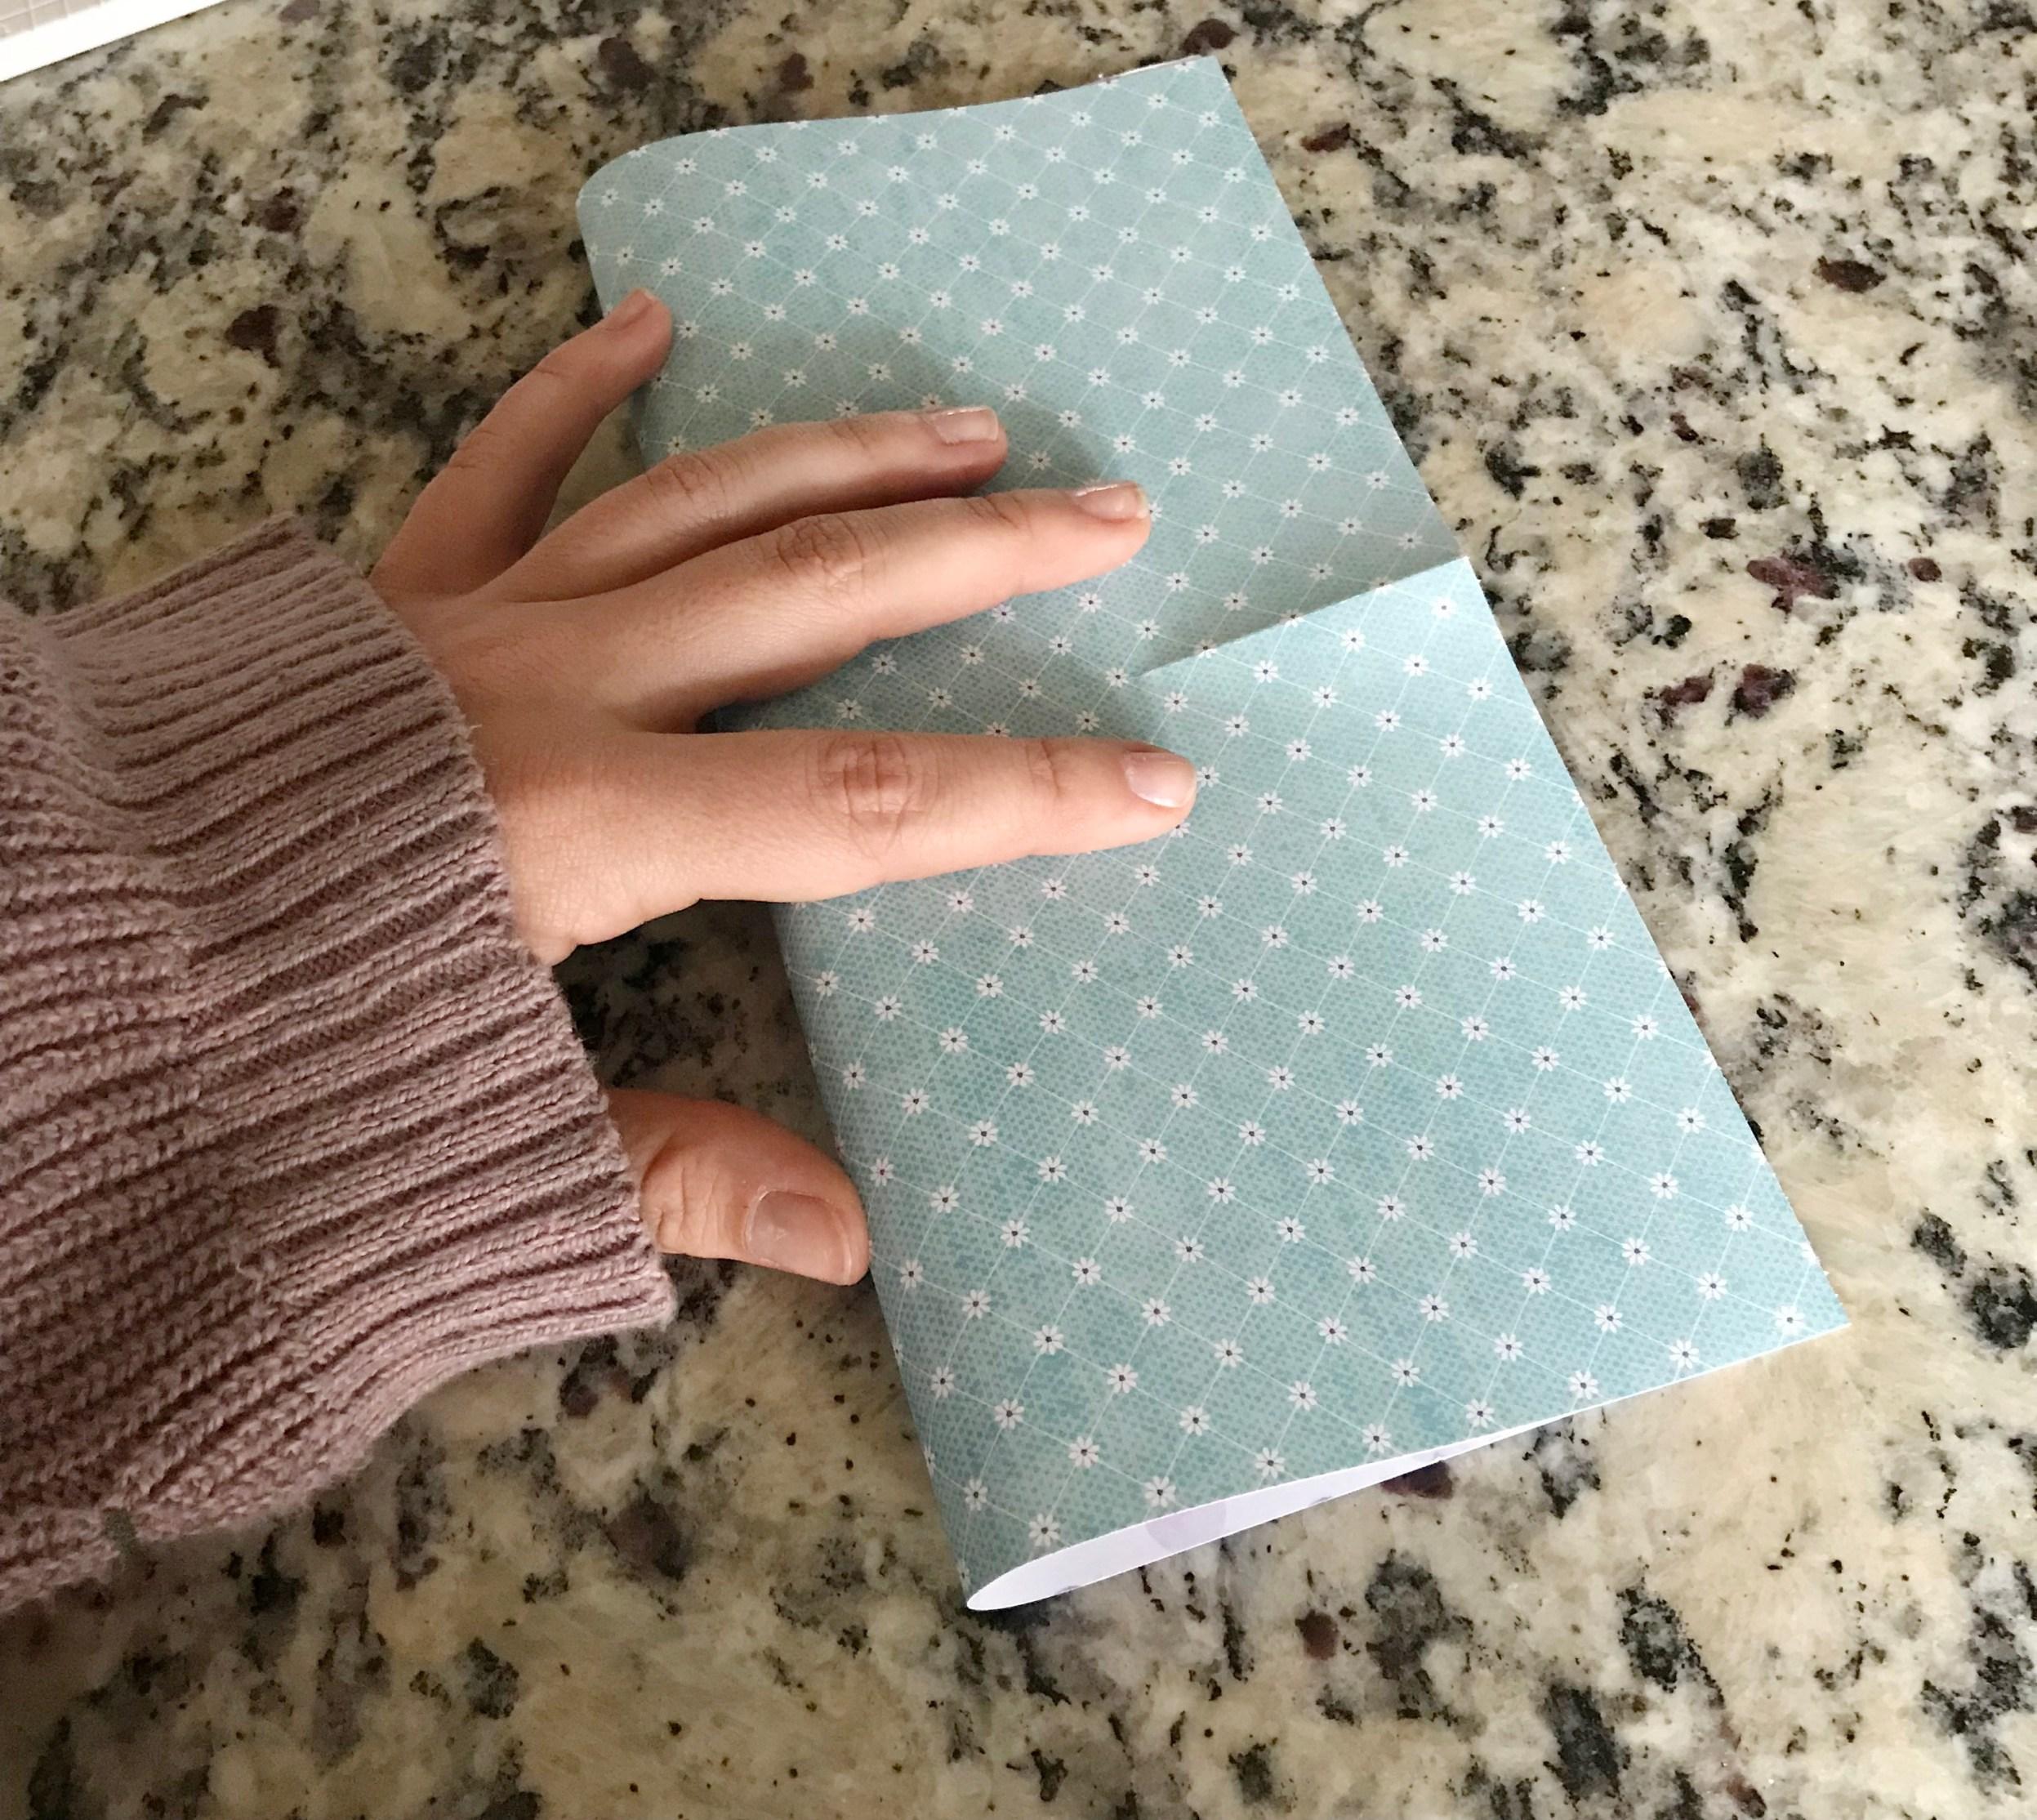 Secret-Garden-DIY-Paper-Craft-Butterfly-Creative-Memories4